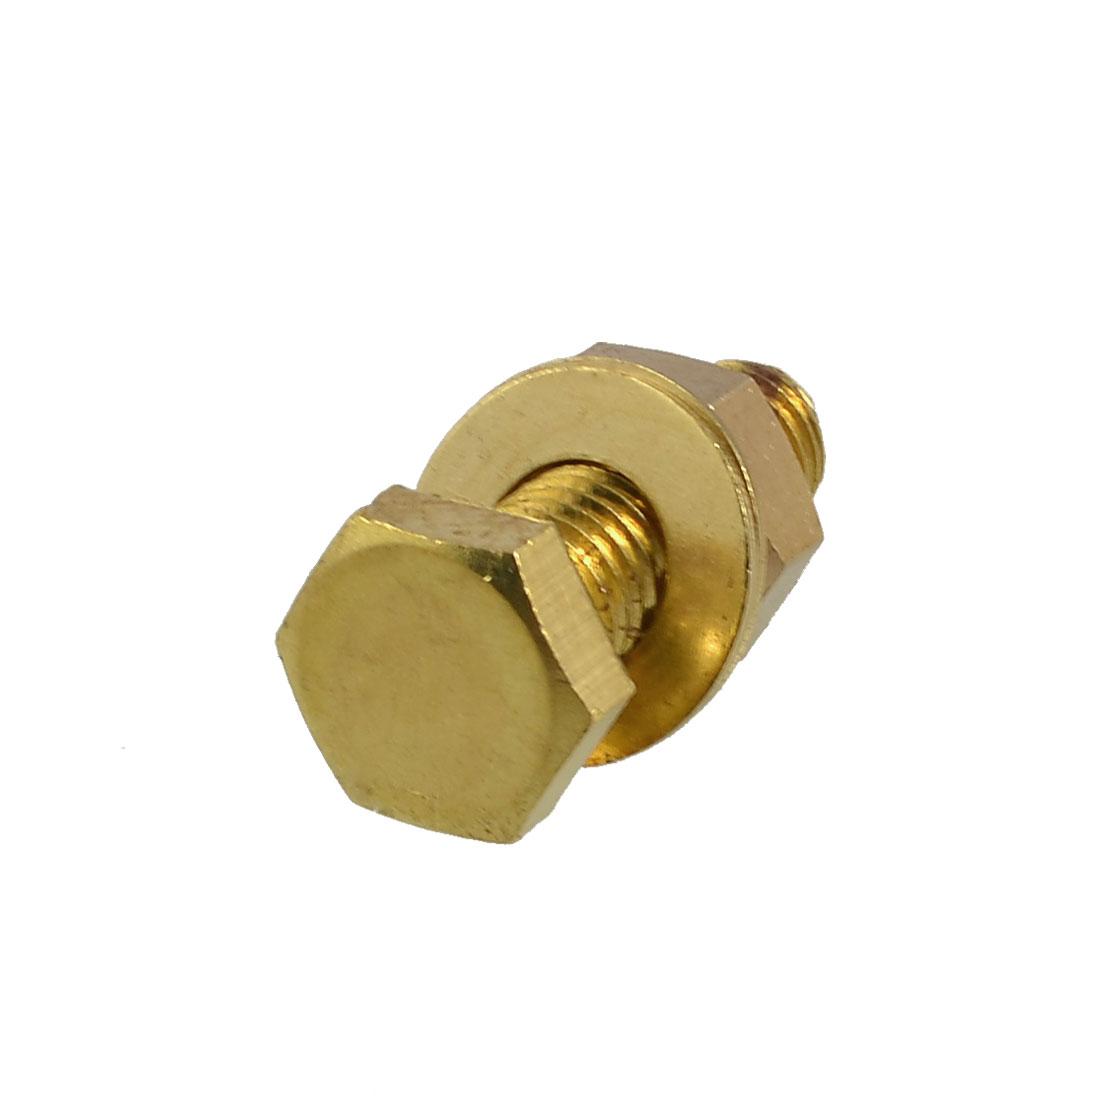 Solid Brass 12mm x 35mm Male Thread Hex Head Screw Nut Washer Set